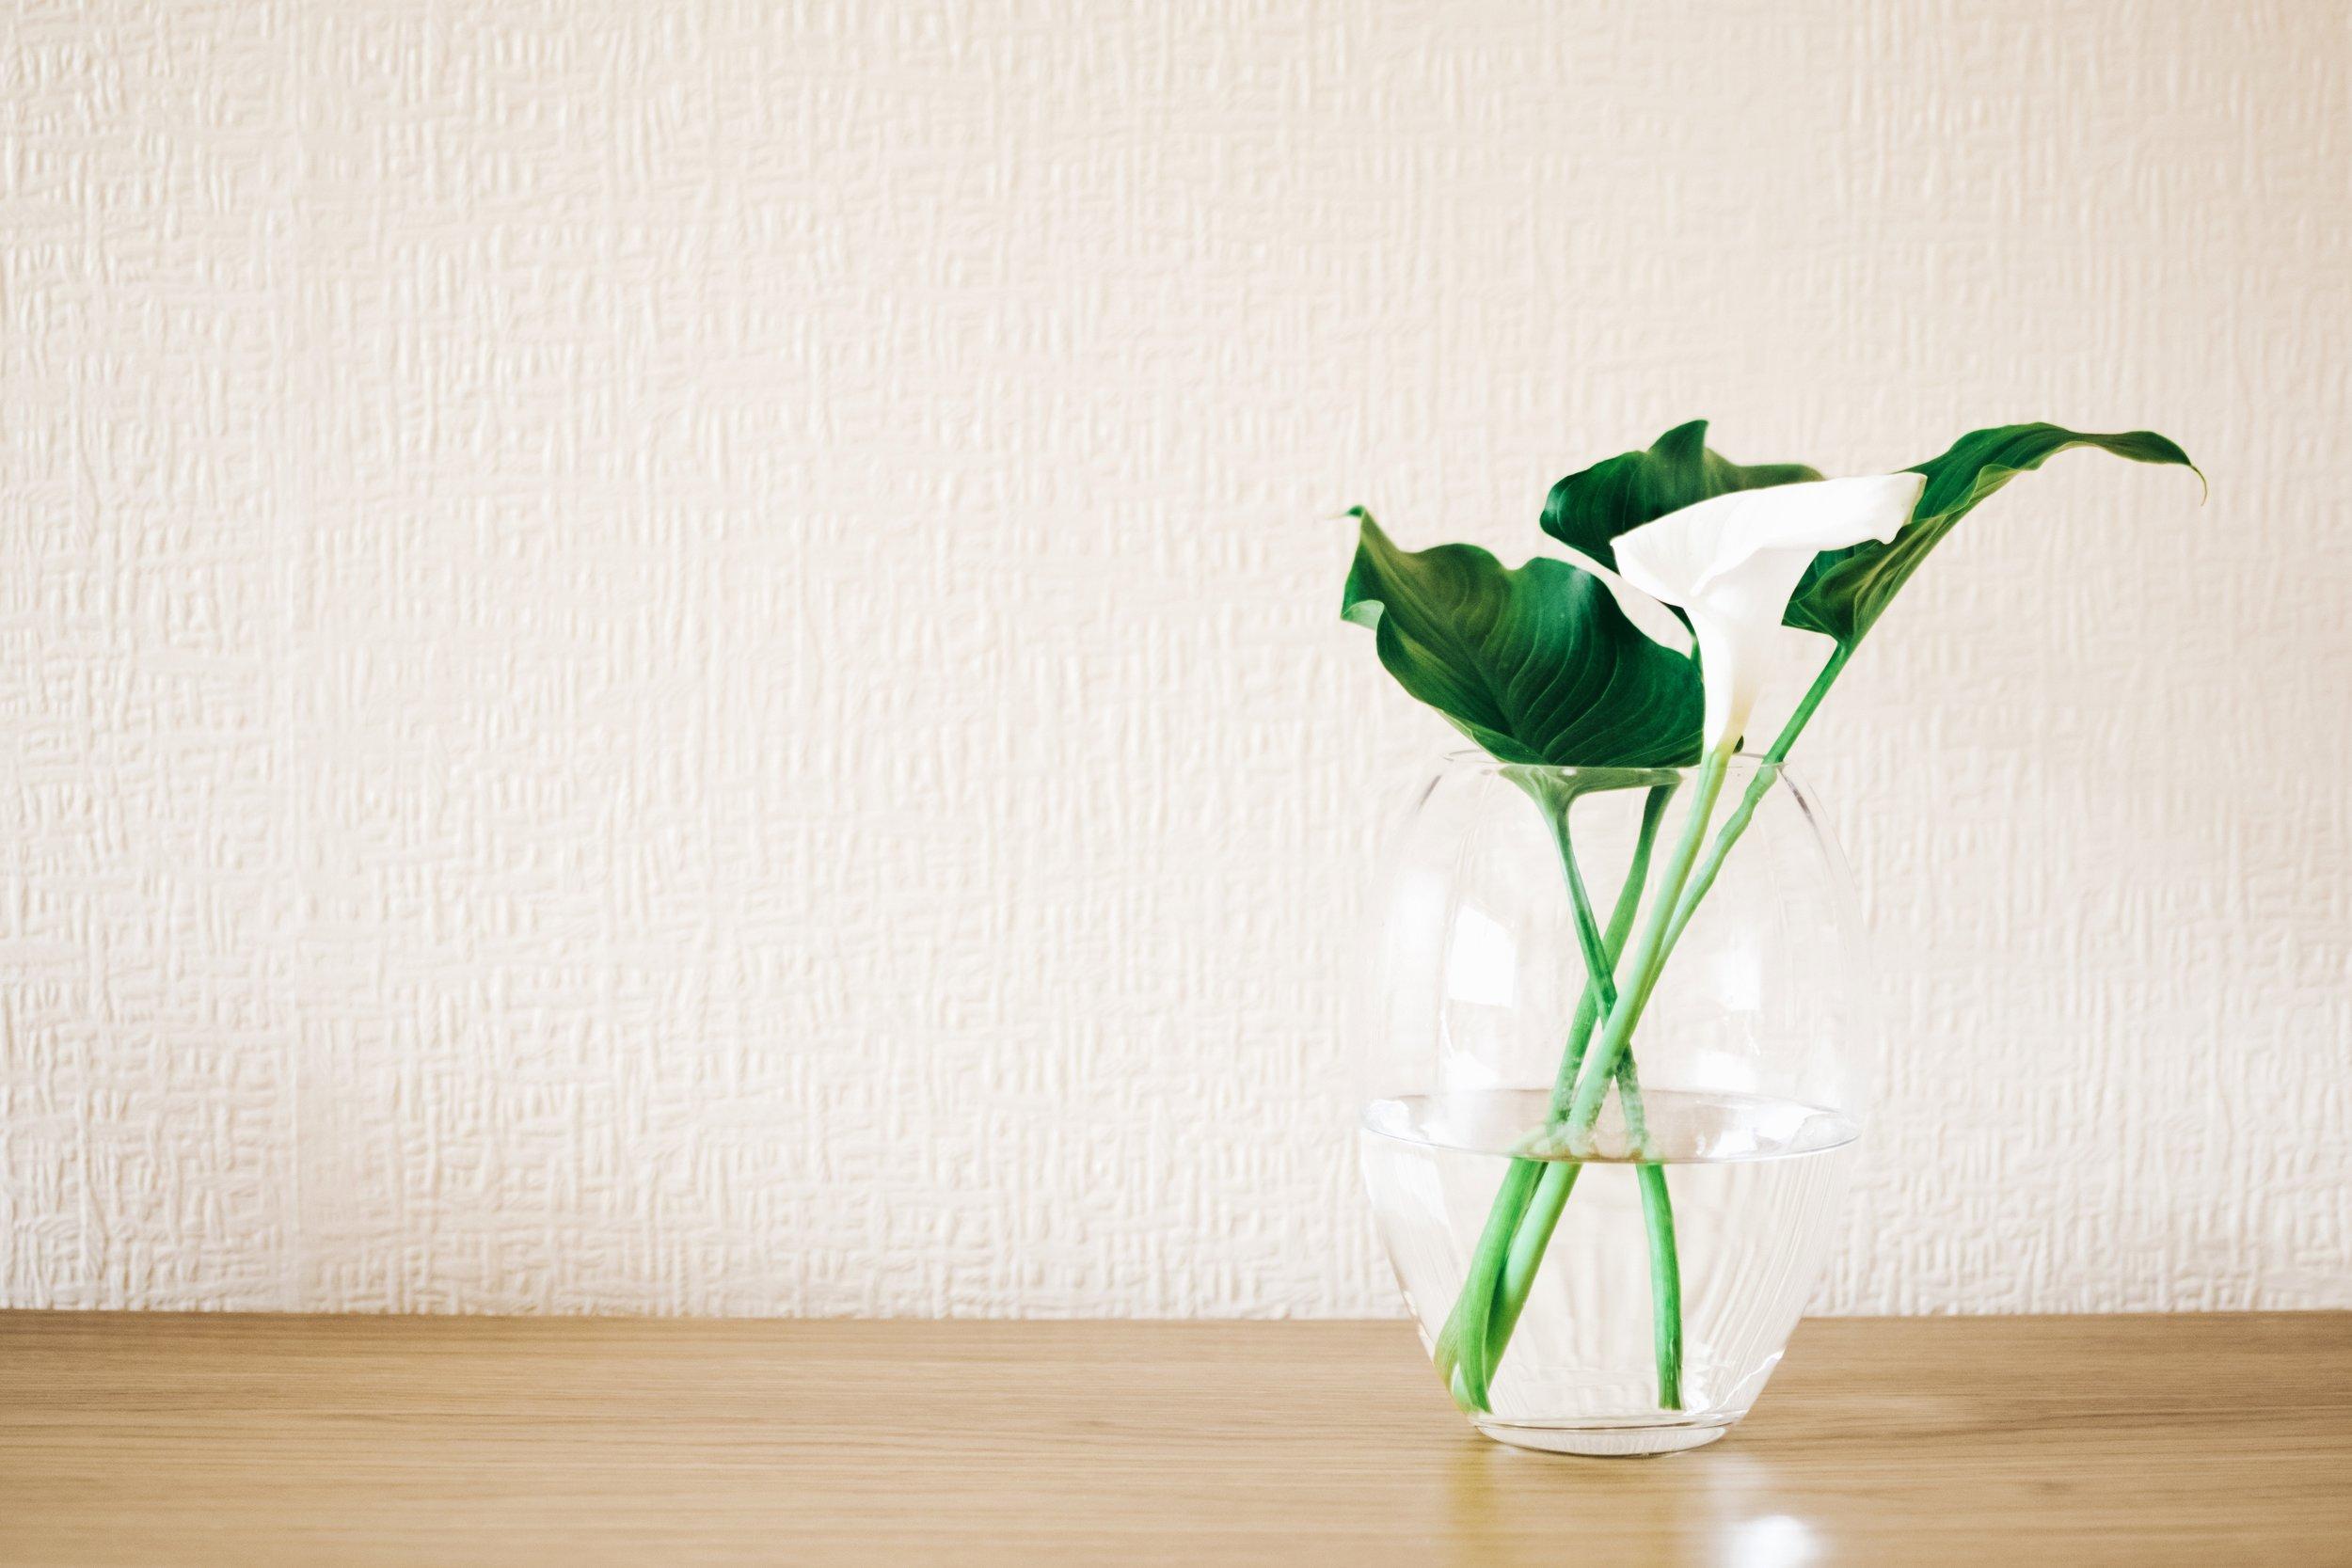 4k-wallpaper-beautiful-bloom-1266302.jpg